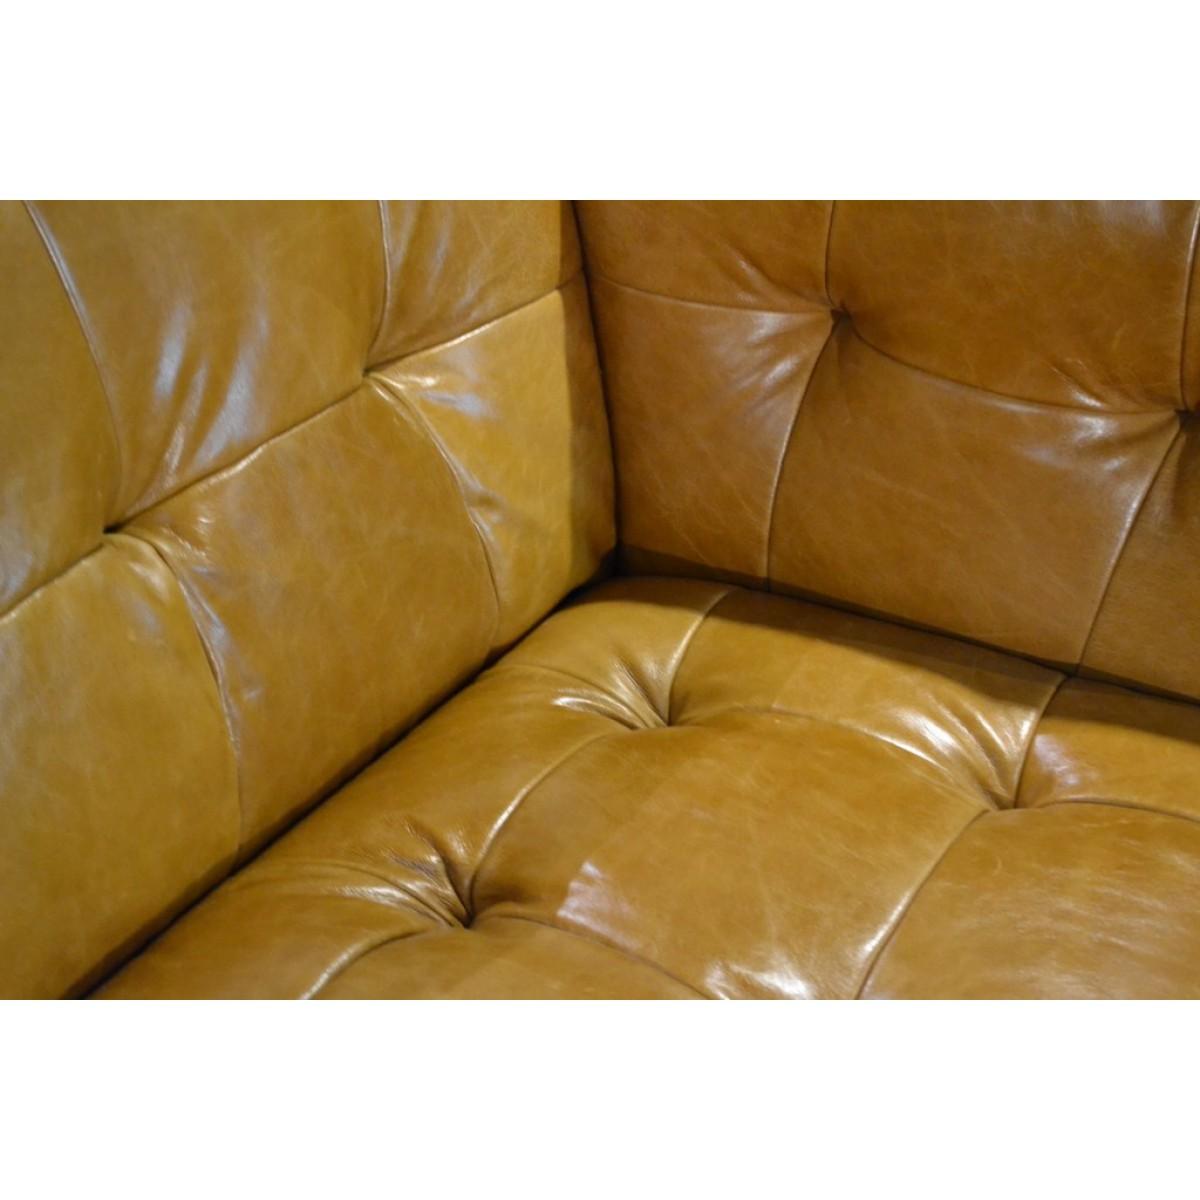 bank_slimm_jim_patch_work_leder_leer_da_silva_tabacco_cognac_tom_club_easy_sofa_detail